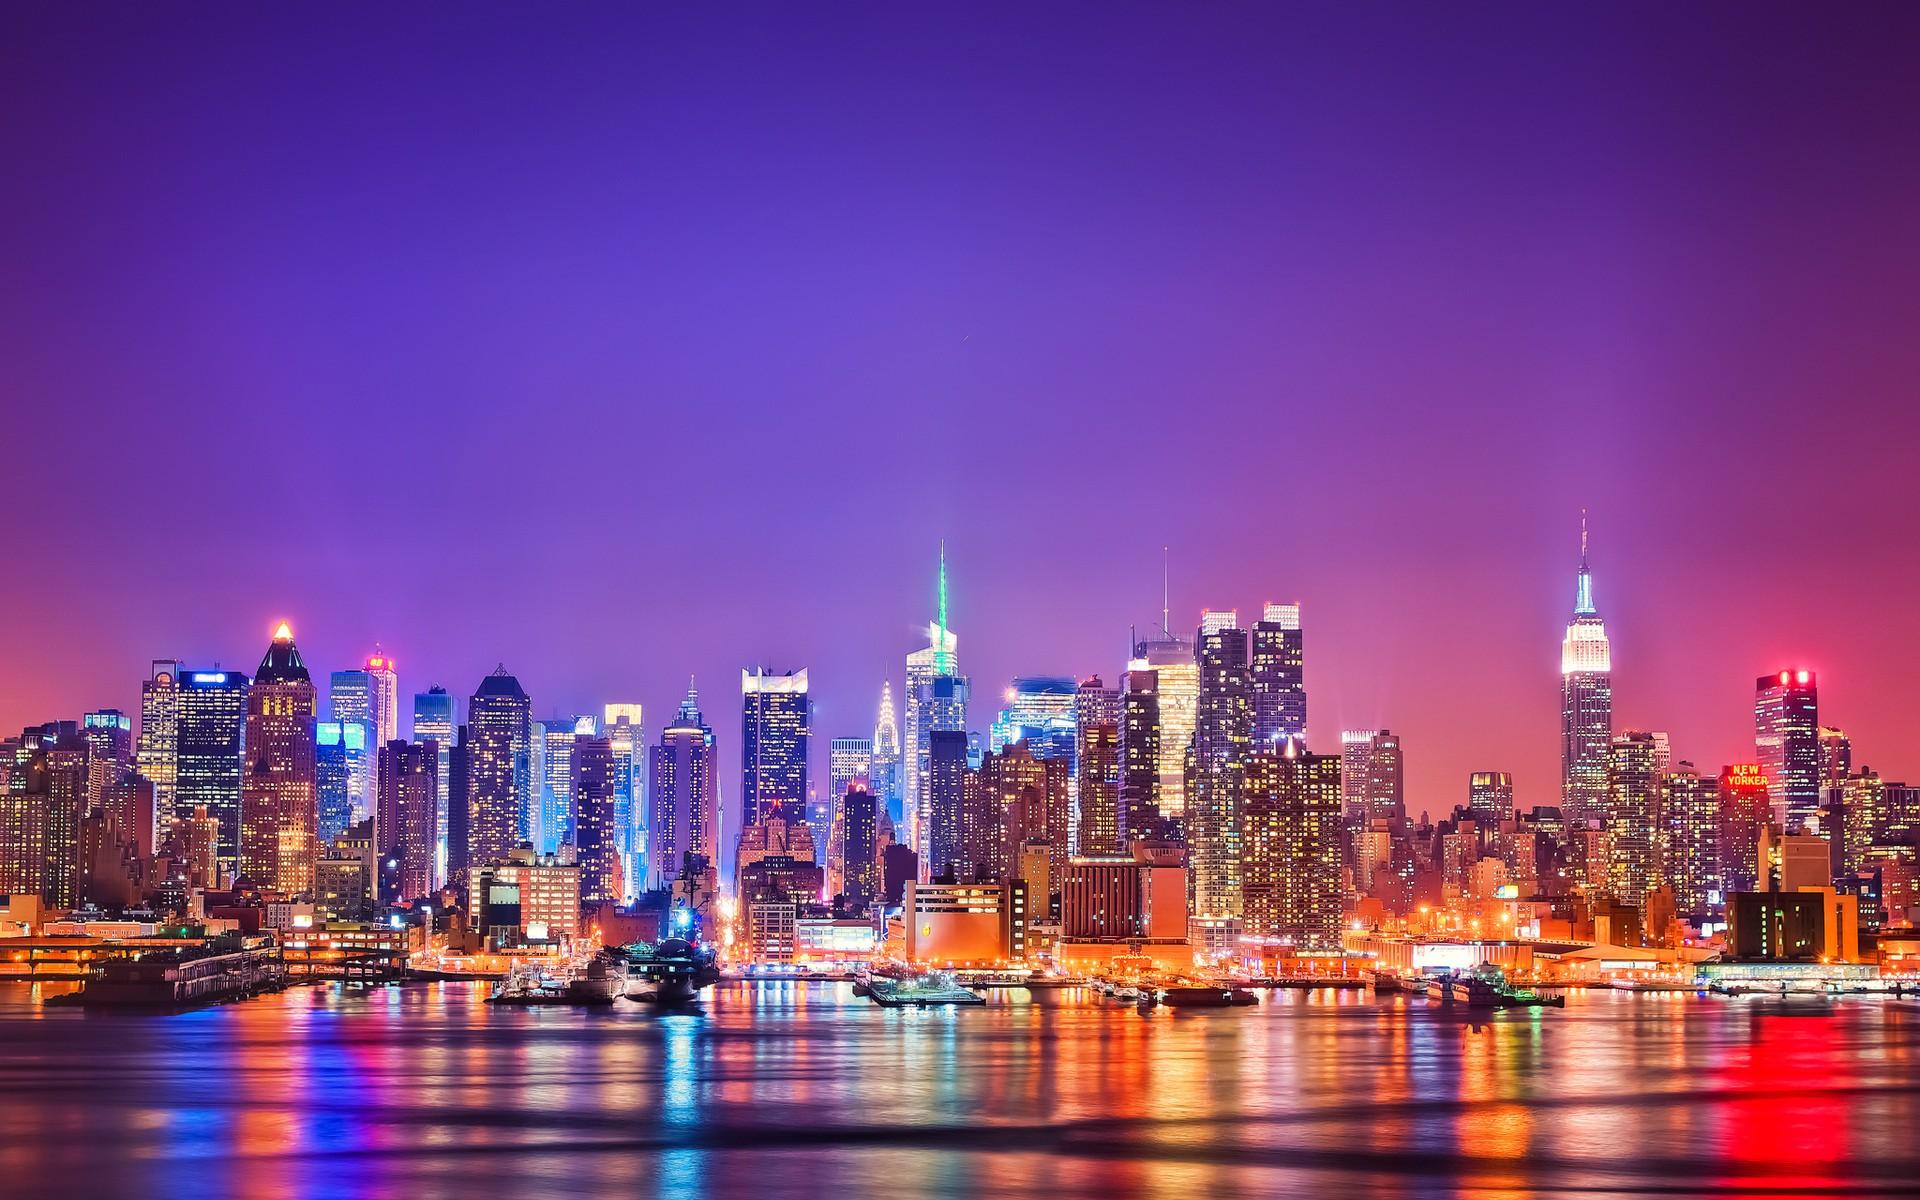 New York Skyline Wallpaper HD 1920x1200